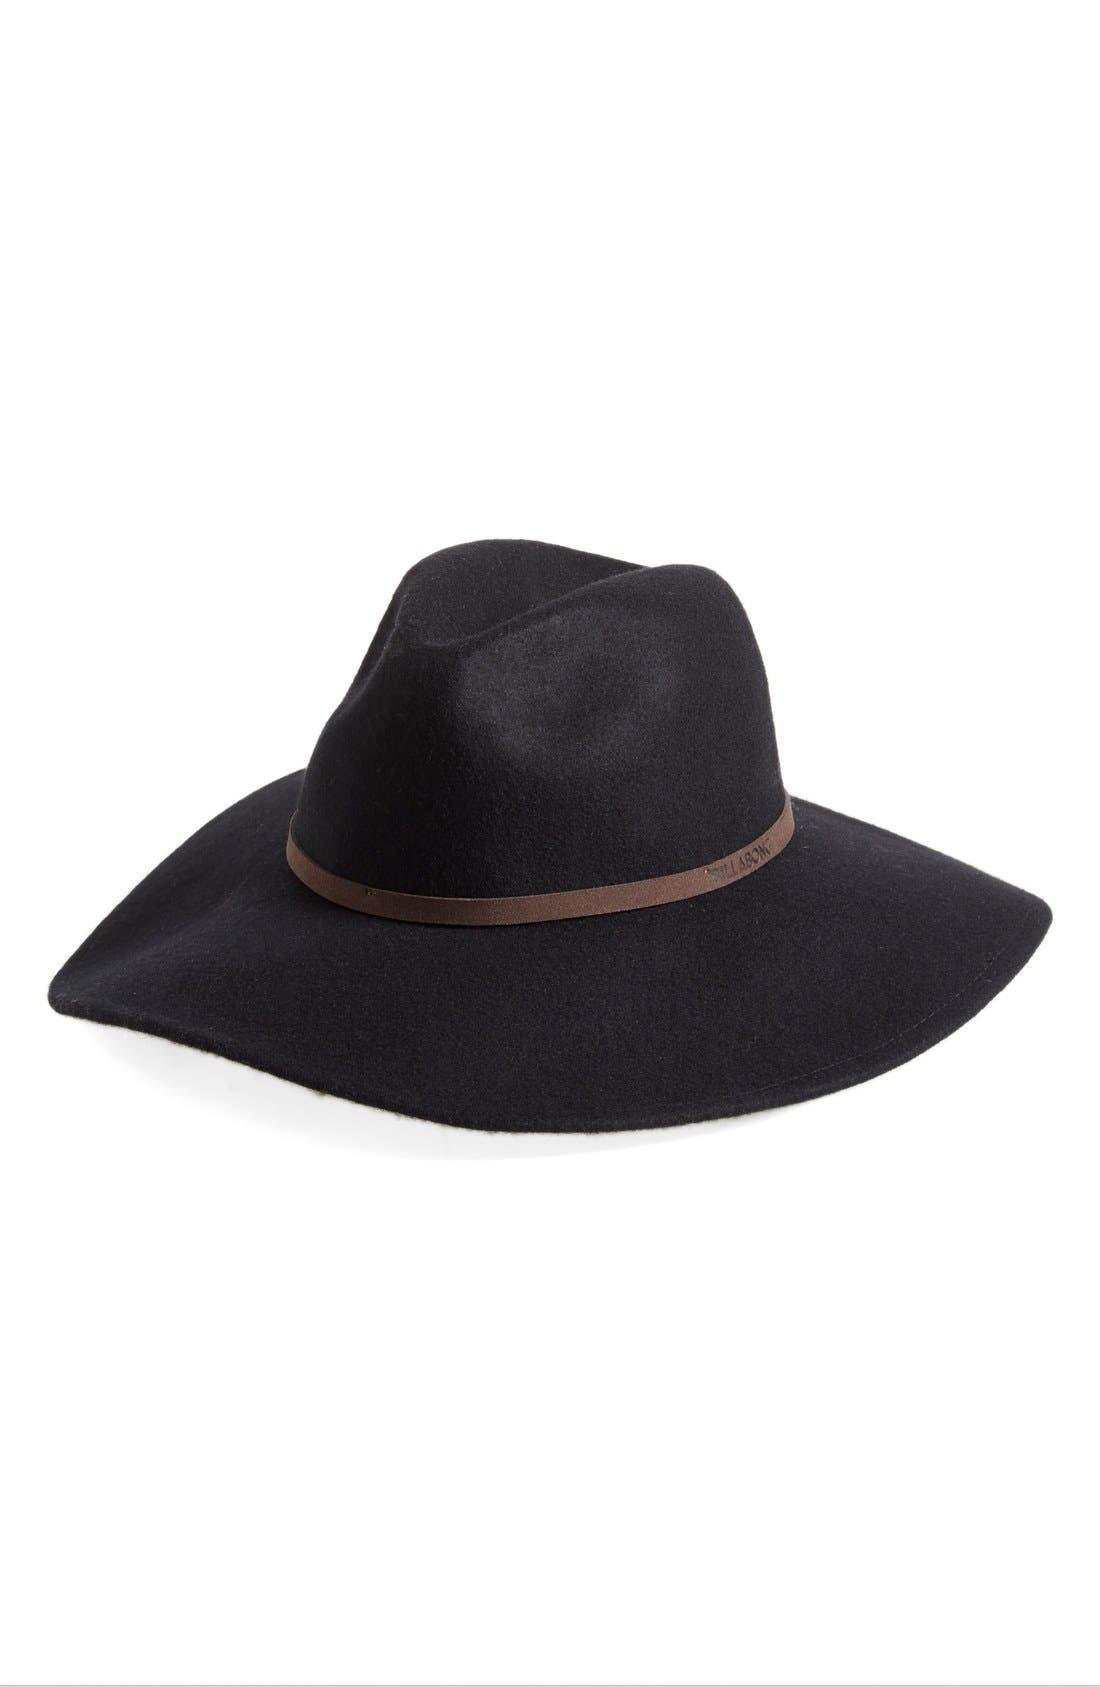 'Moon Gaze' Wool Panama Hat,                             Main thumbnail 1, color,                             015